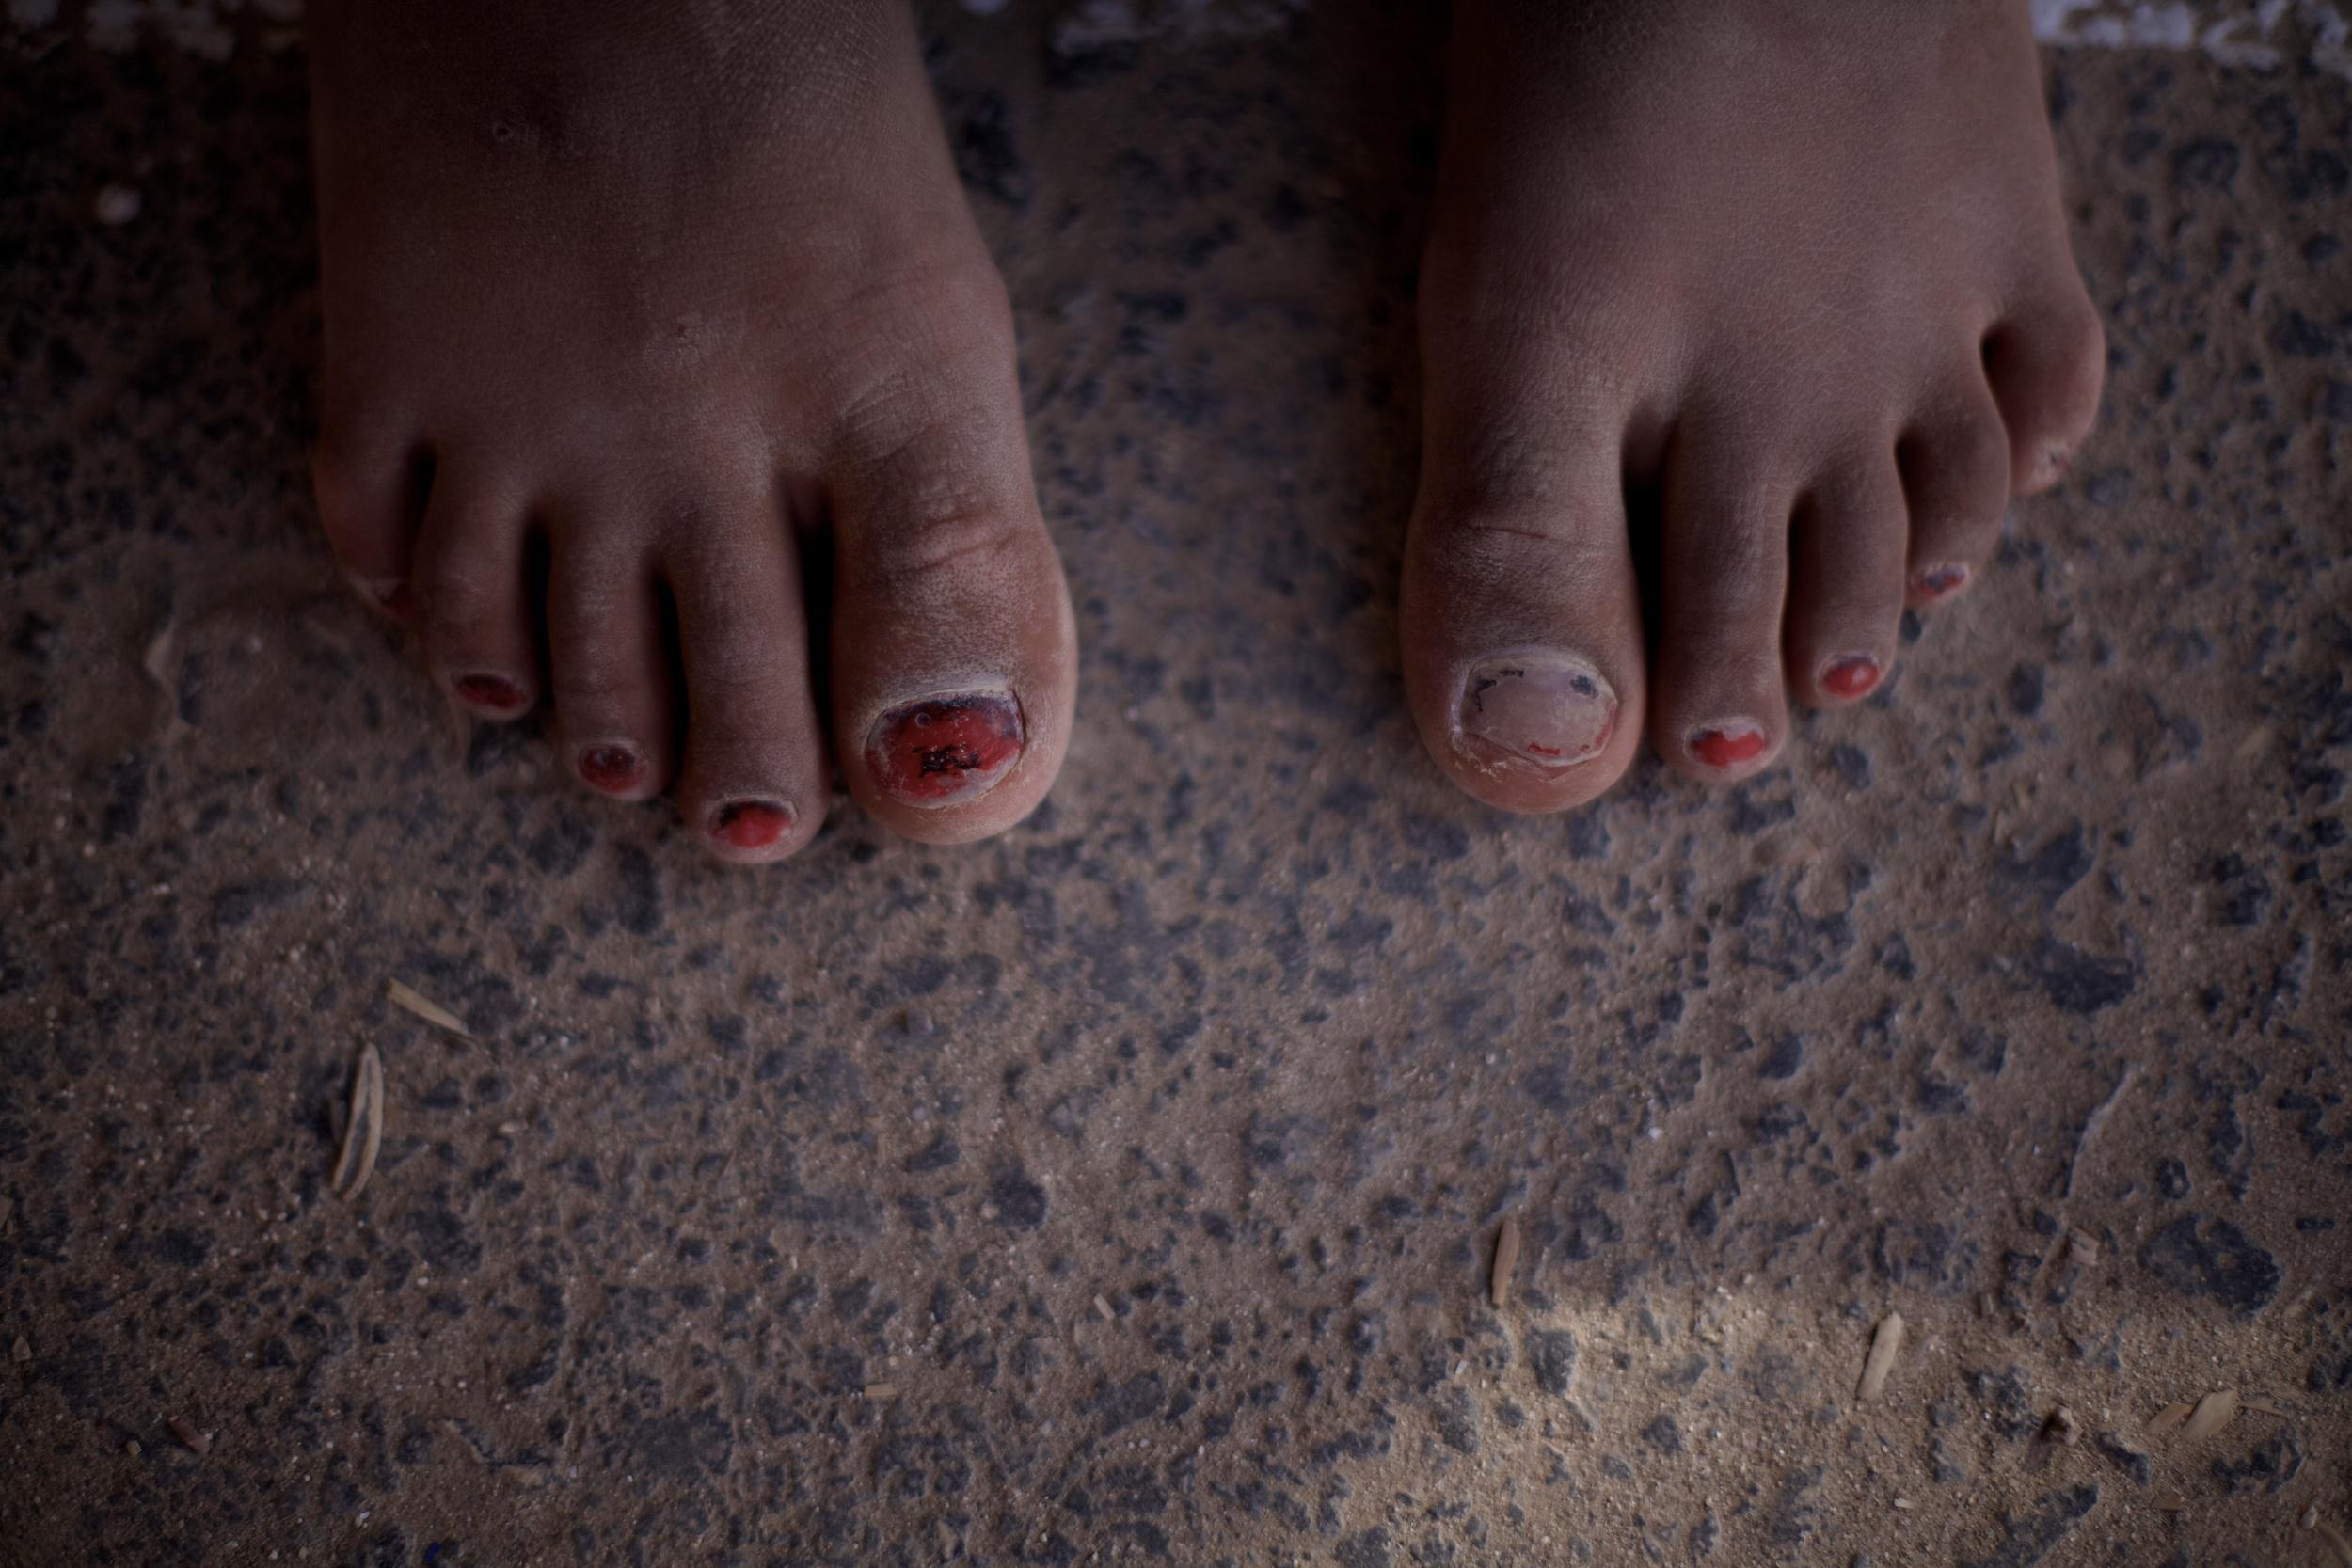 Two week old toe nail polish at Zaatari refugee camp in Jordan.